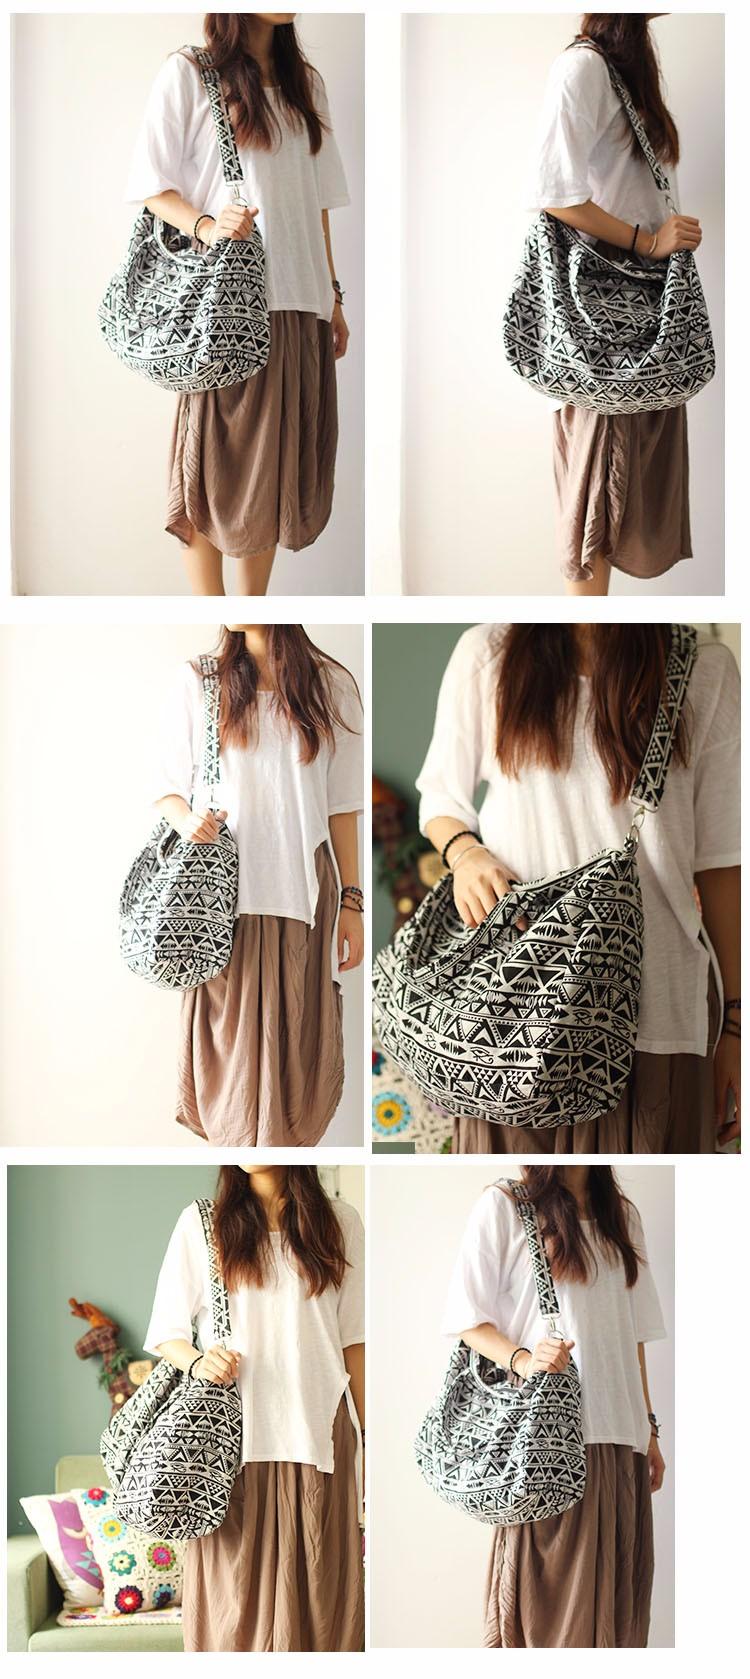 Canvas Leather Trim Travel Tote Duffel shoulder handbag Weekend Bag (5)